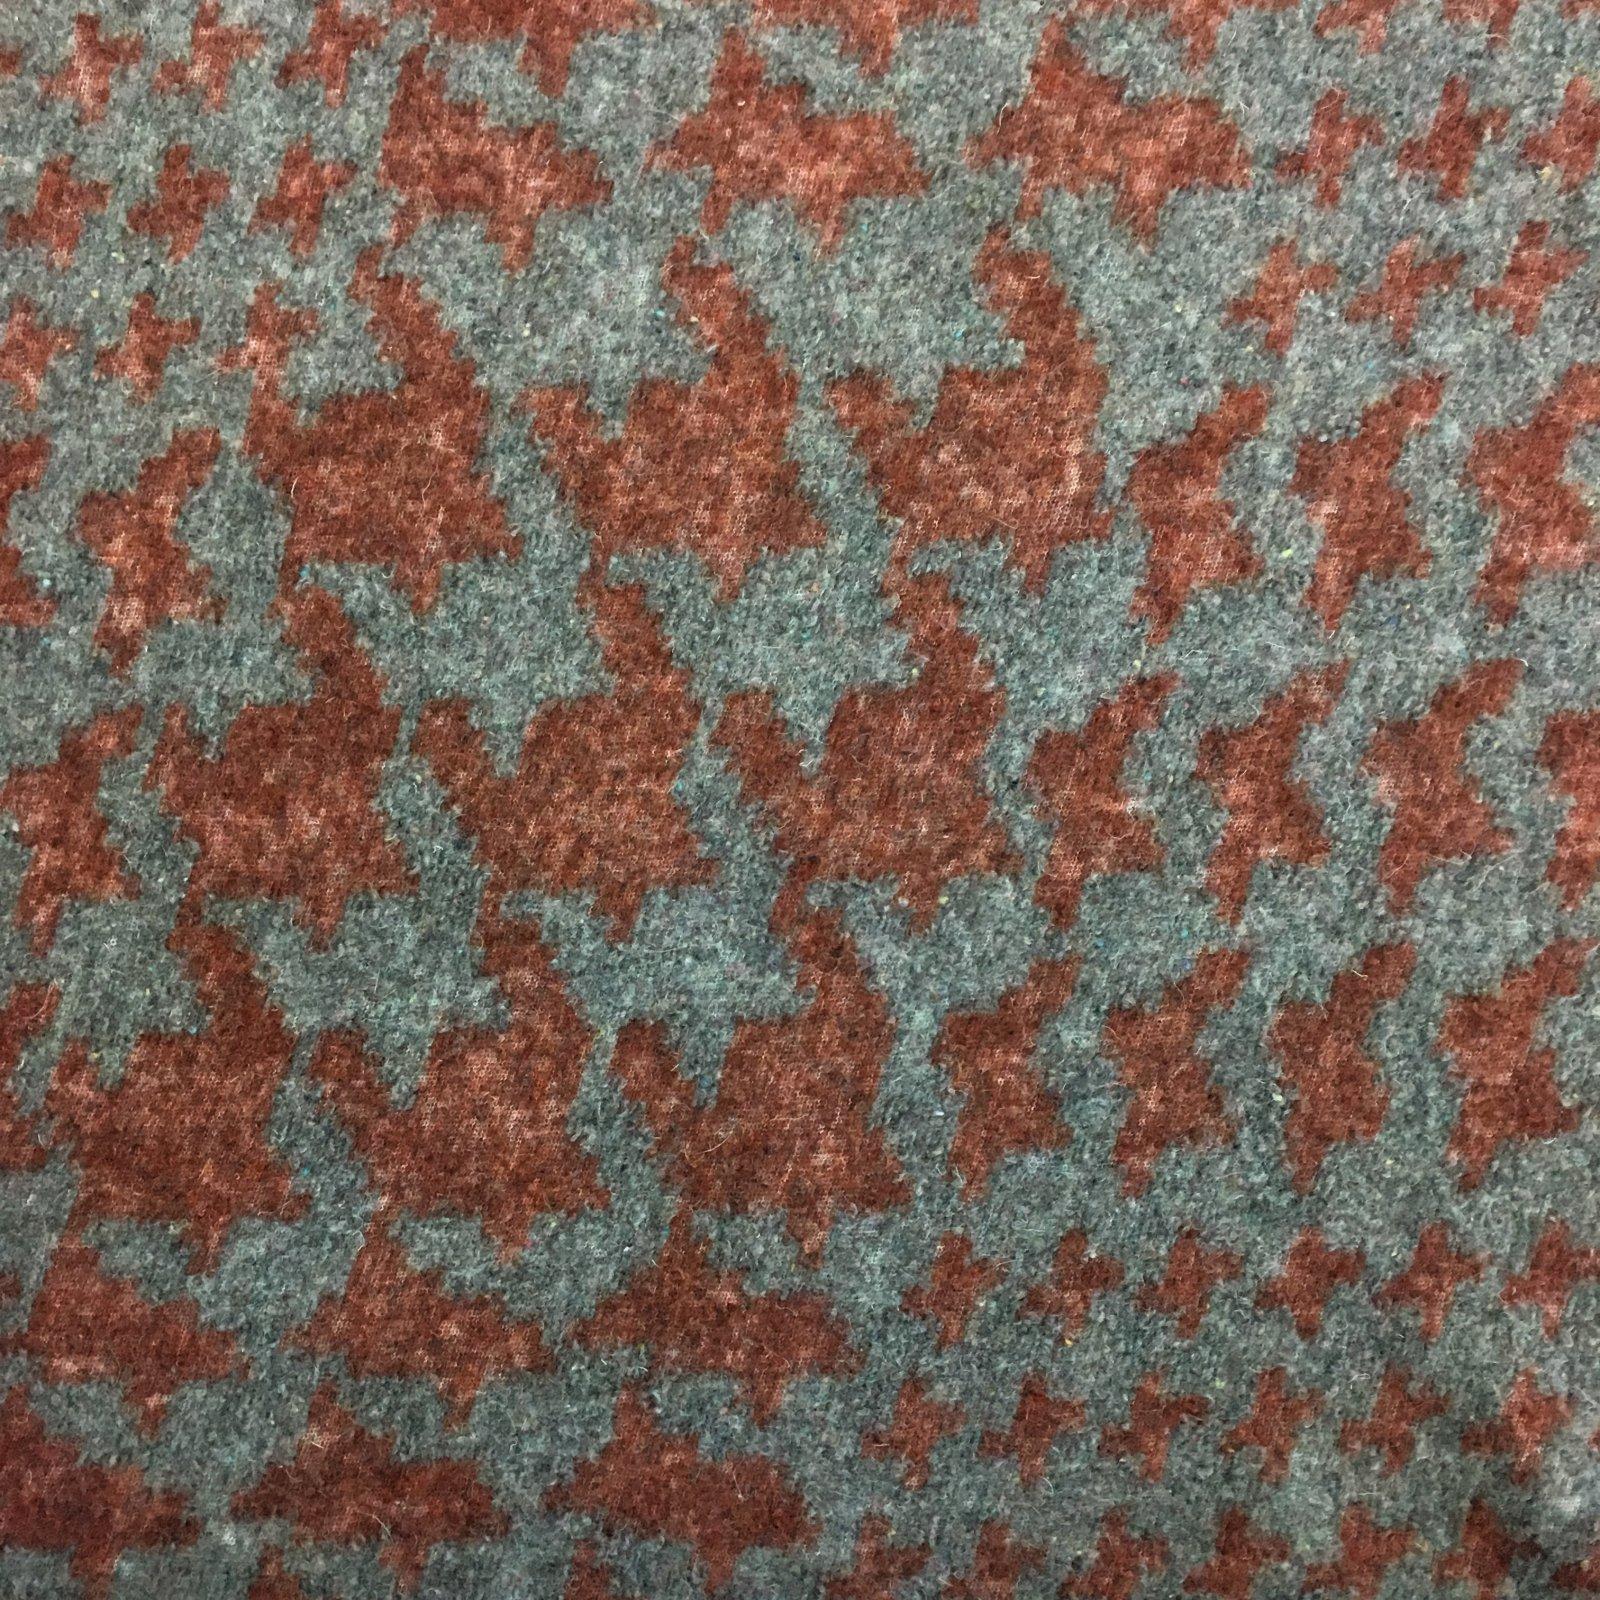 Italian Wool Sweater Knit - Rust Houndstooth